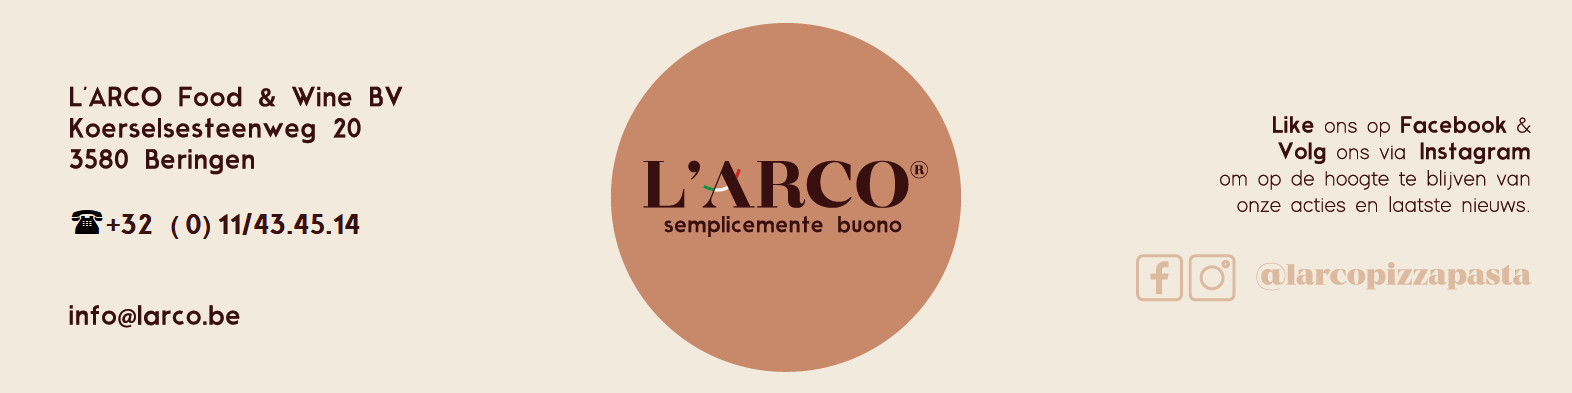 L'ARCO Banner